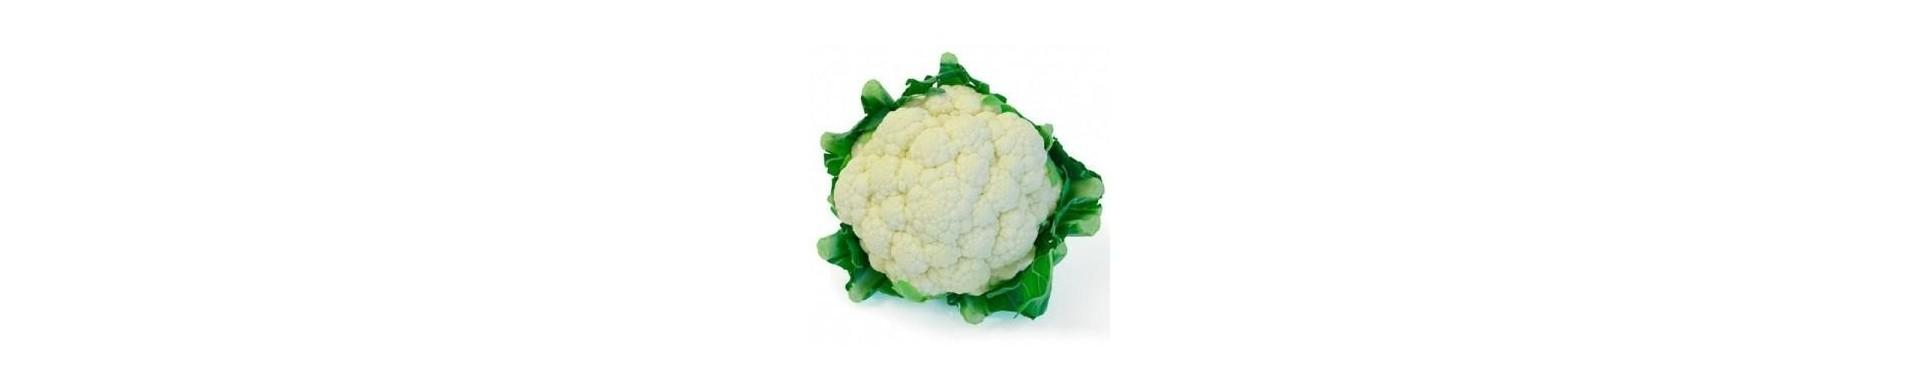 Plant cauliflower - Buy cauliflower plants